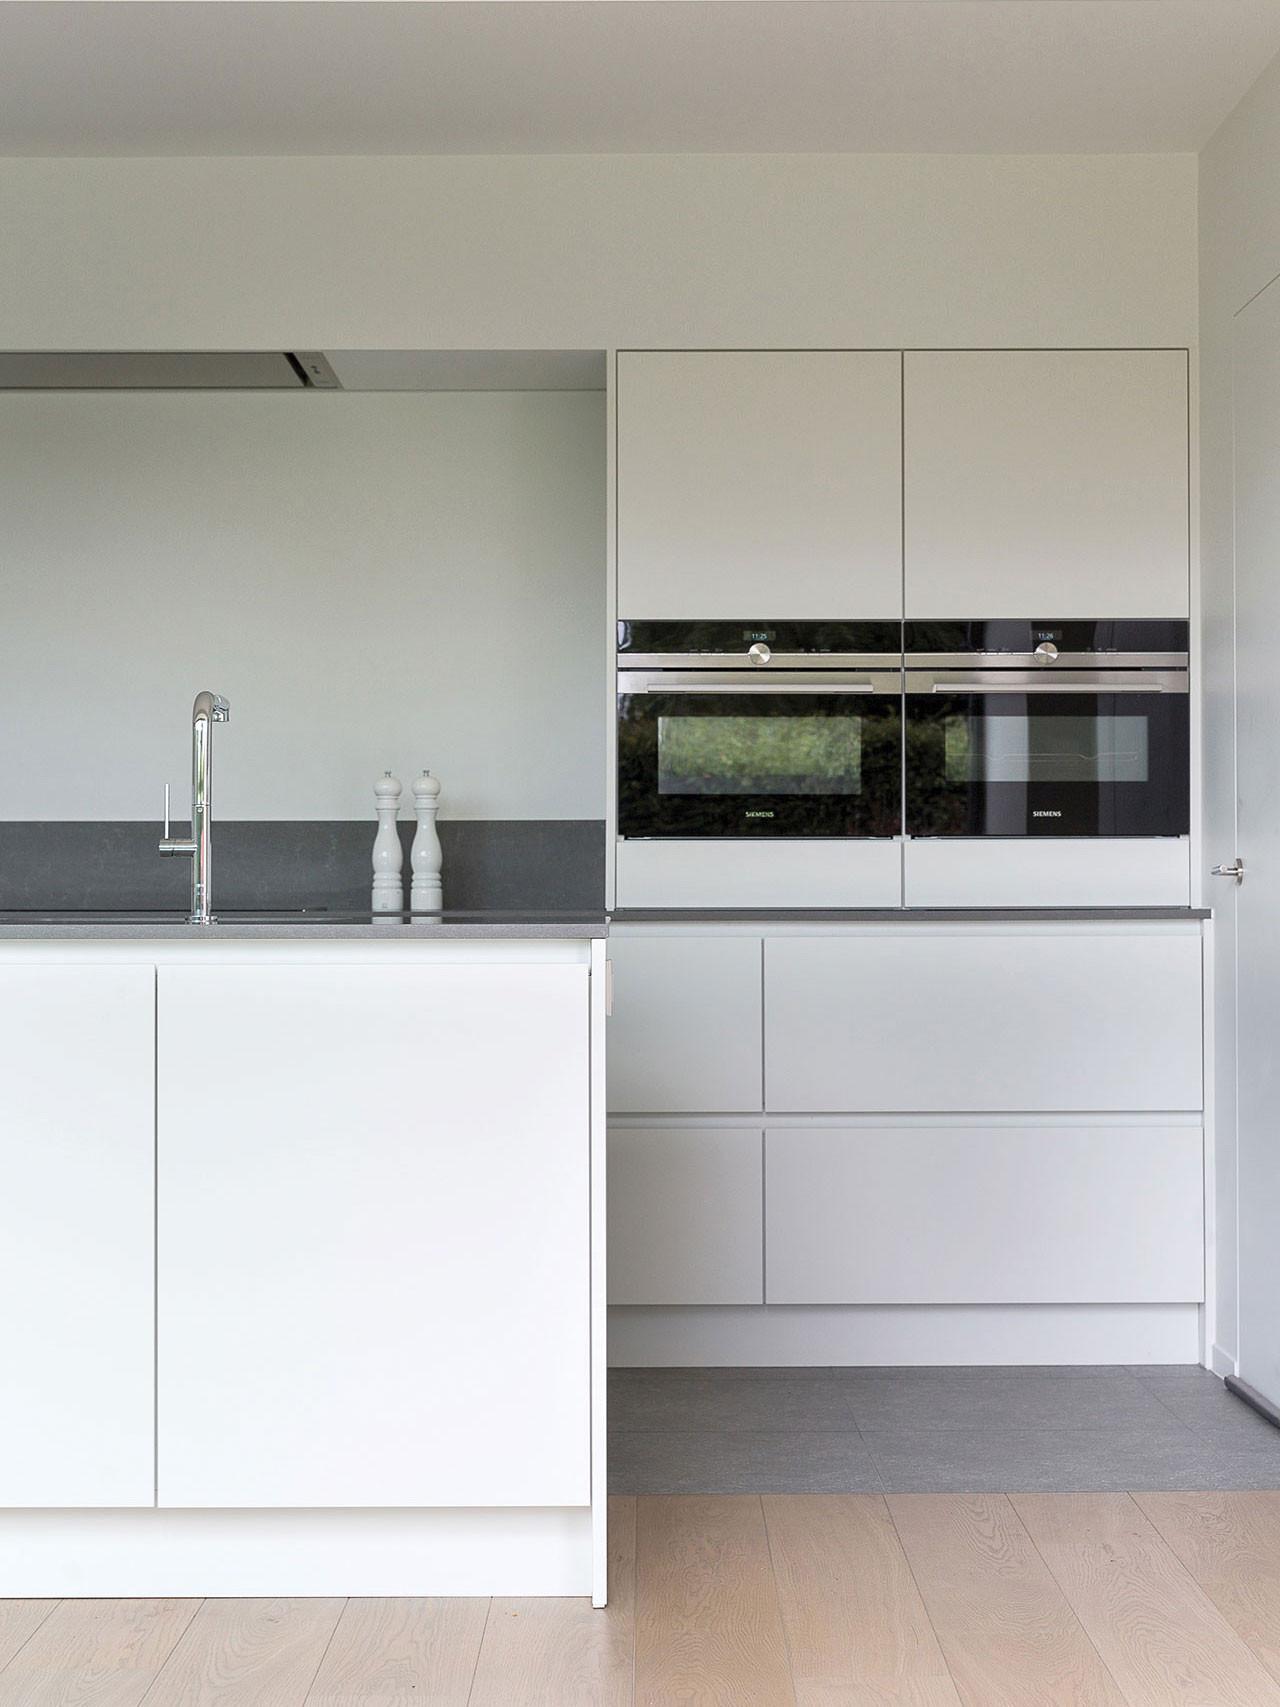 Dekeyzer-hedendaagse-keuken-poederlak-wit-composiet-2.jpg